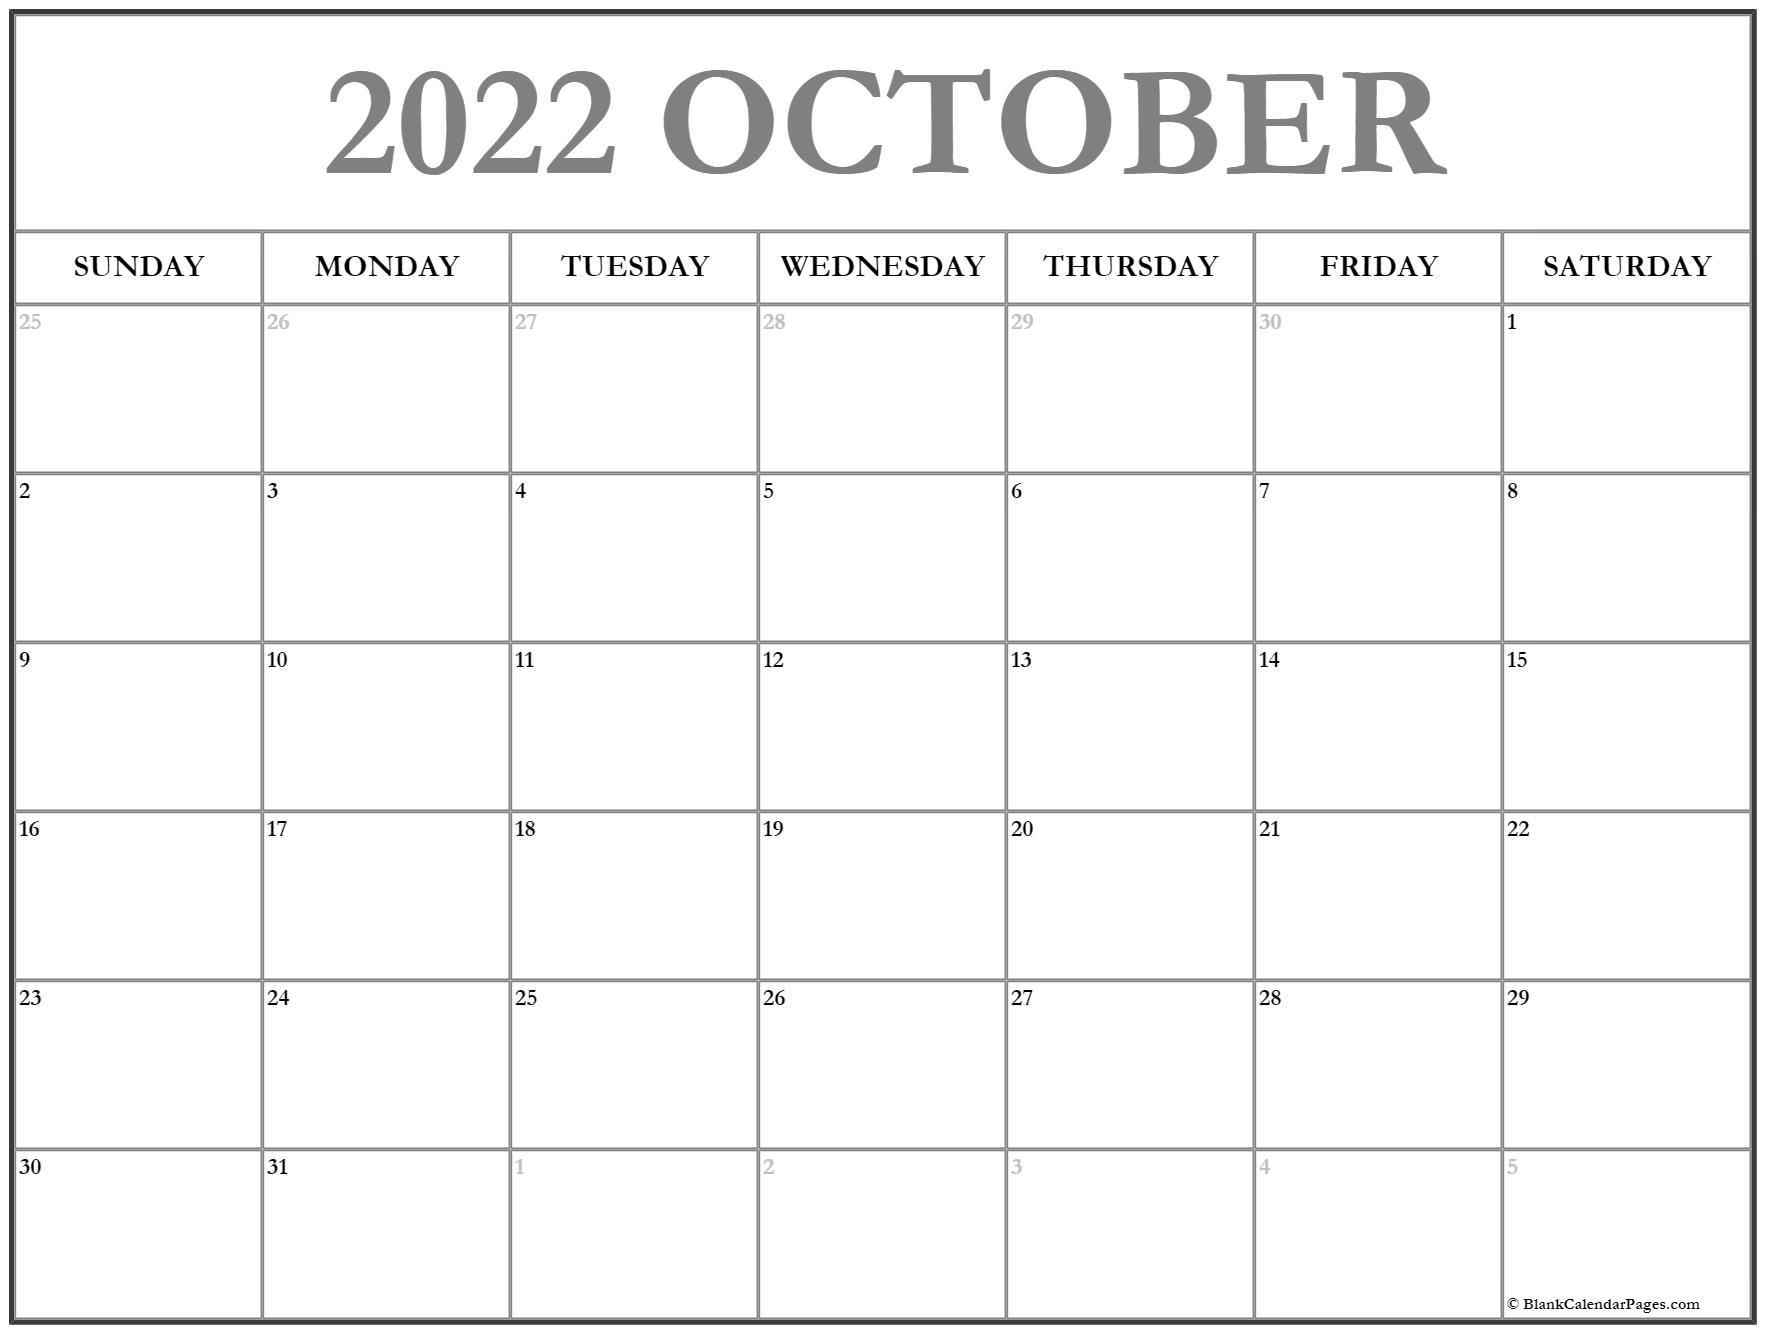 image regarding October Free Printable Calendar titled Oct 2019 calendar absolutely free printable month to month calendars